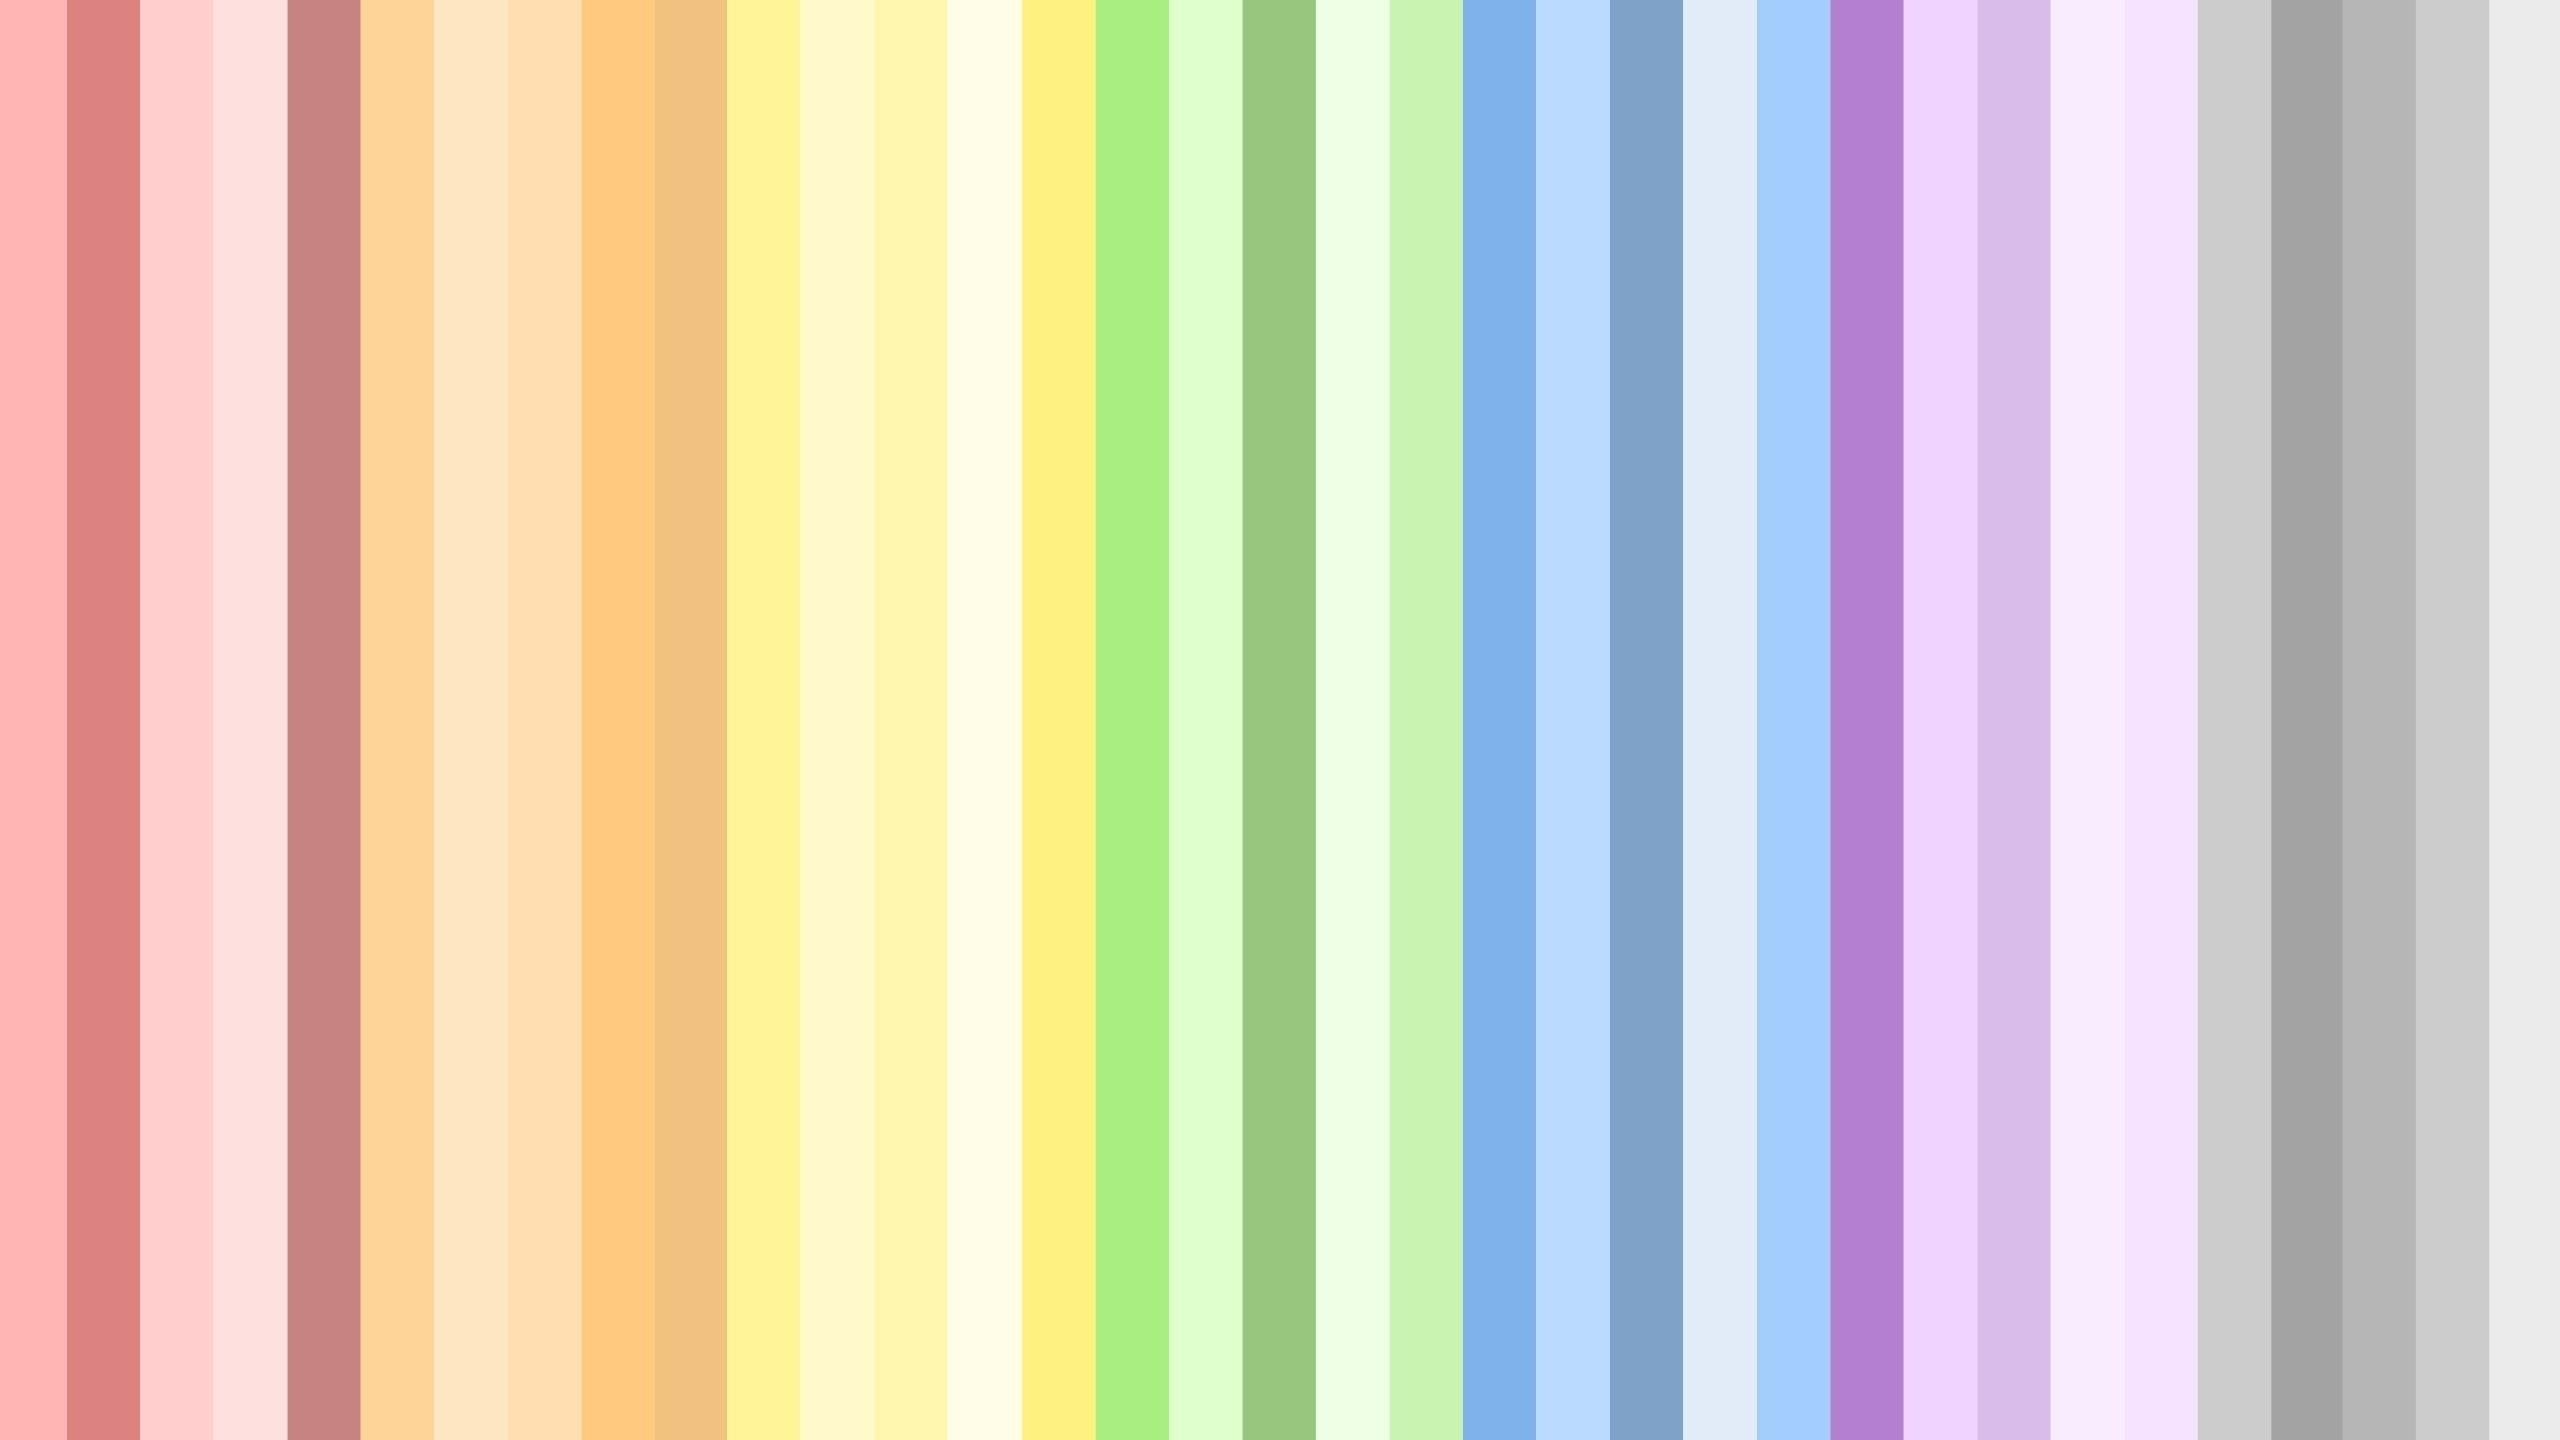 190 Vertical Wallpaper Hd: Vertical Wallpapers High Quality